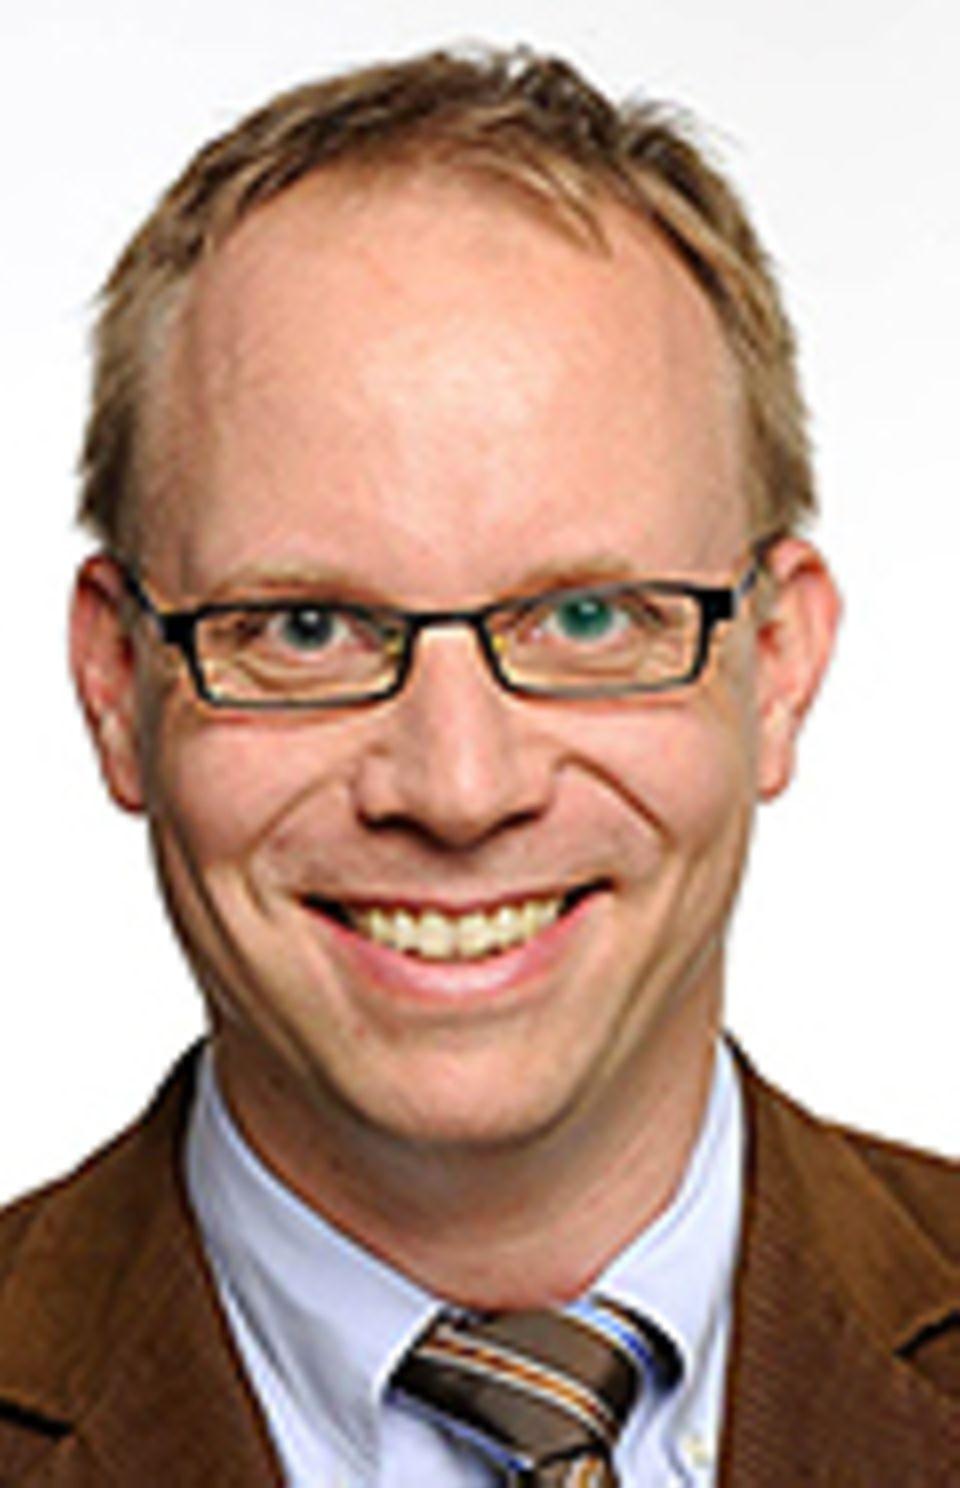 Internationales Jahr des Bodens: Dr. Jes Weigelt ist Koordinator des Global Soil Forums am IASS, Institute for Advanced Sustainability Studies, Potsdam